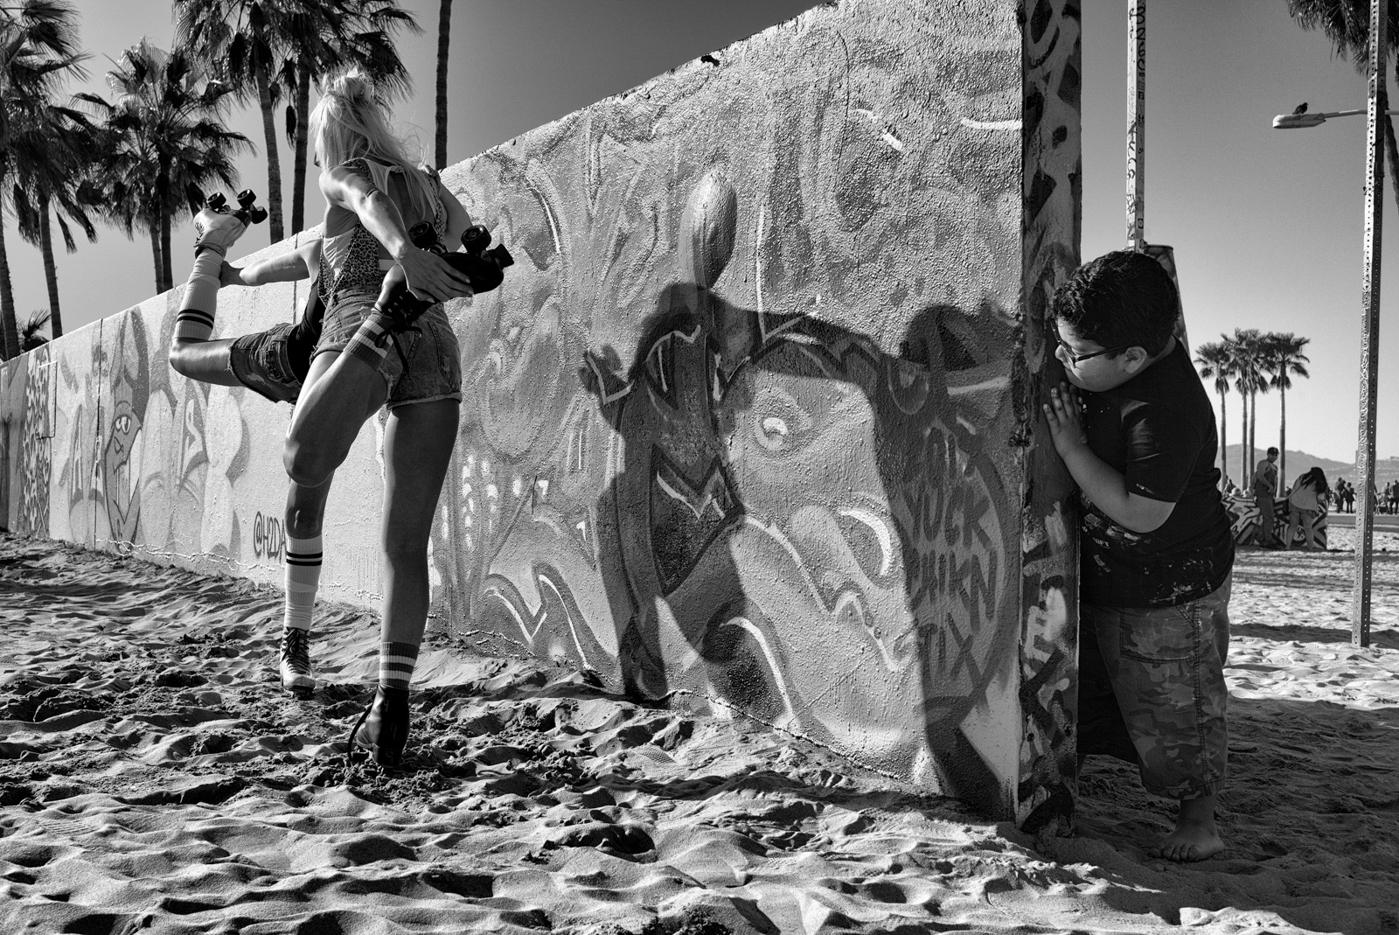 Peeking from Behind the Graffiti Wall © Dotan Saguy